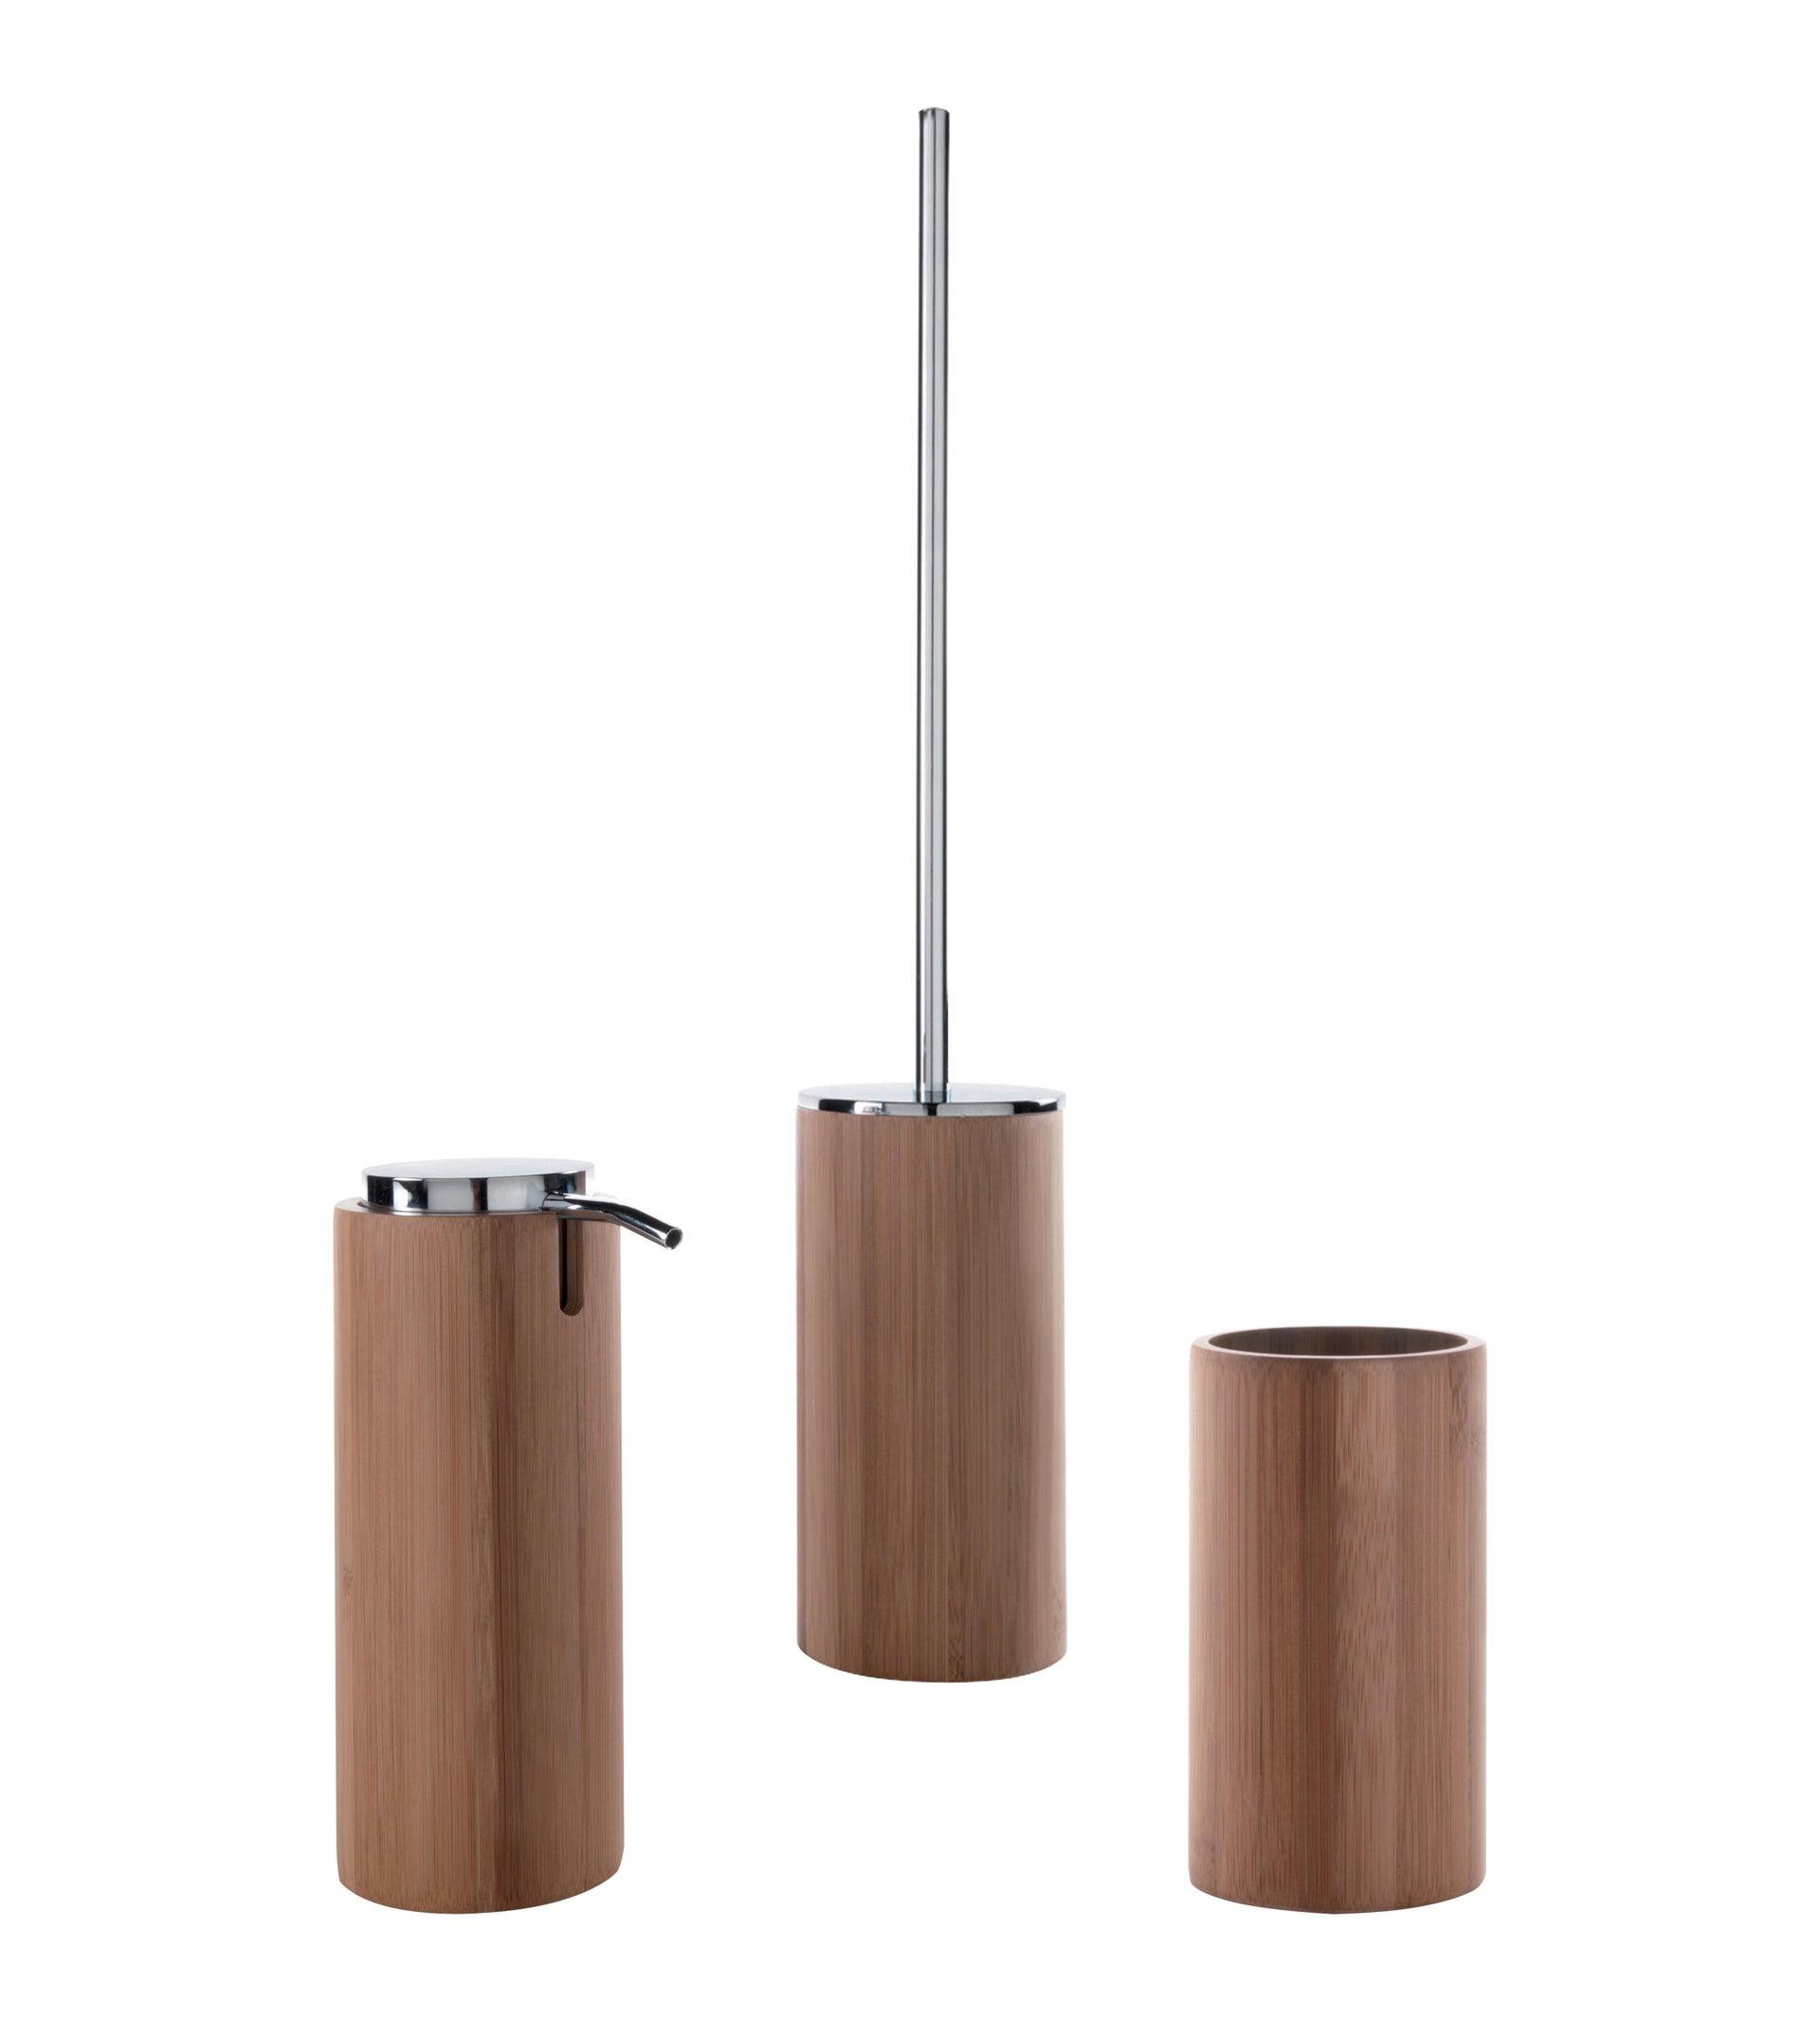 Set di accessori per bagno legno in bambù